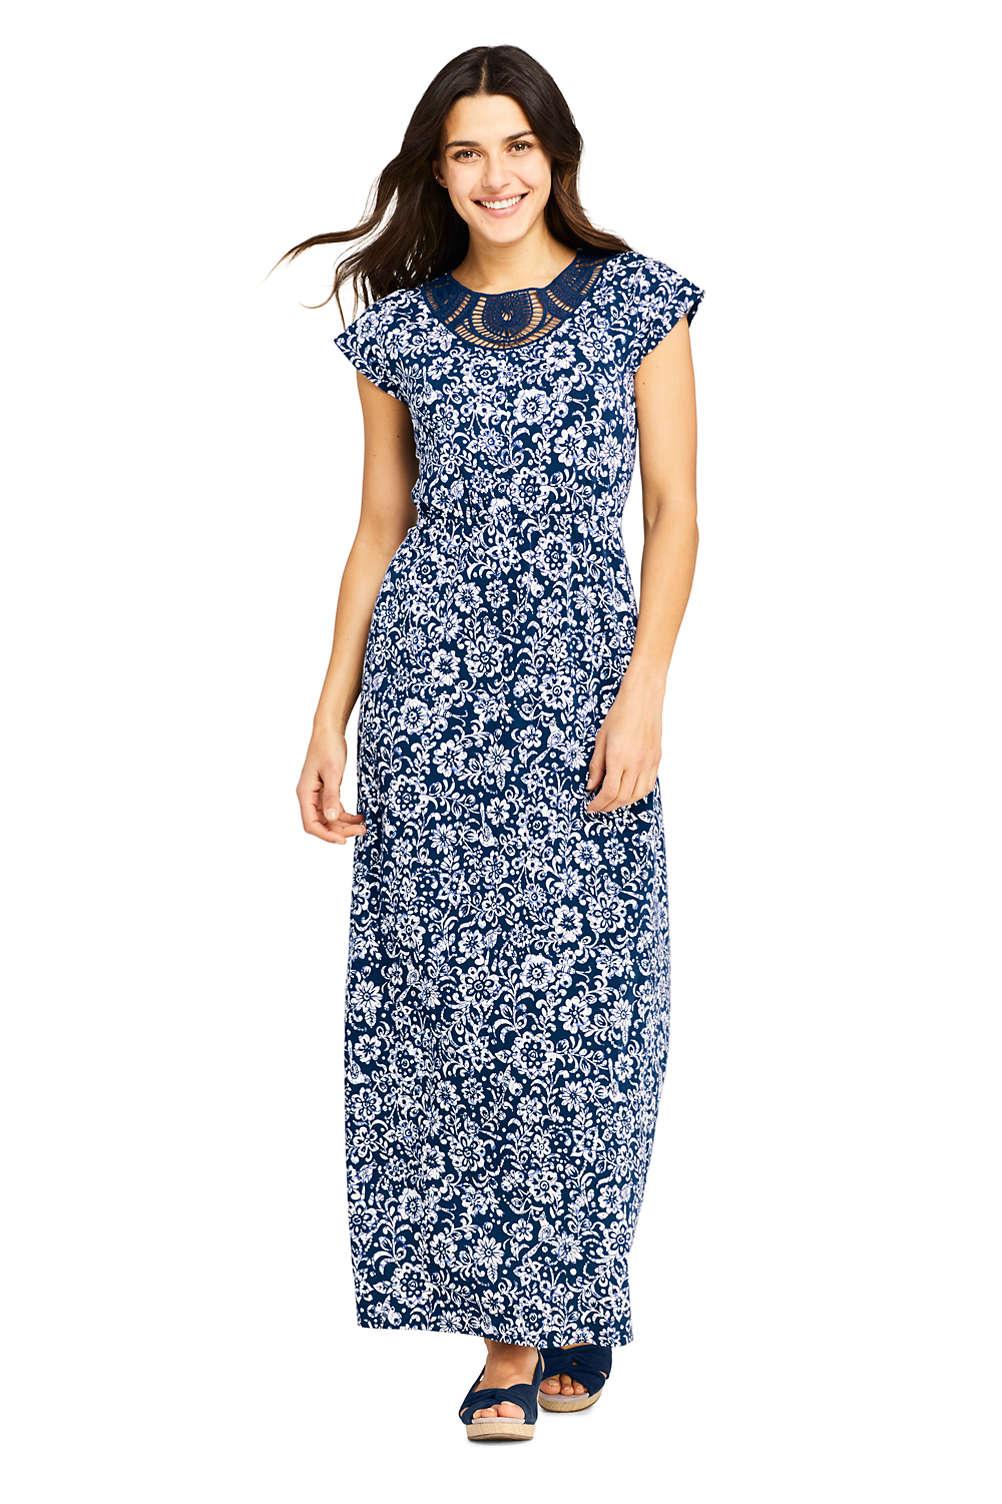 ad77afeefb Women's Short Sleeve Knit Crochet Neck Print Maxi Dress from Lands' End